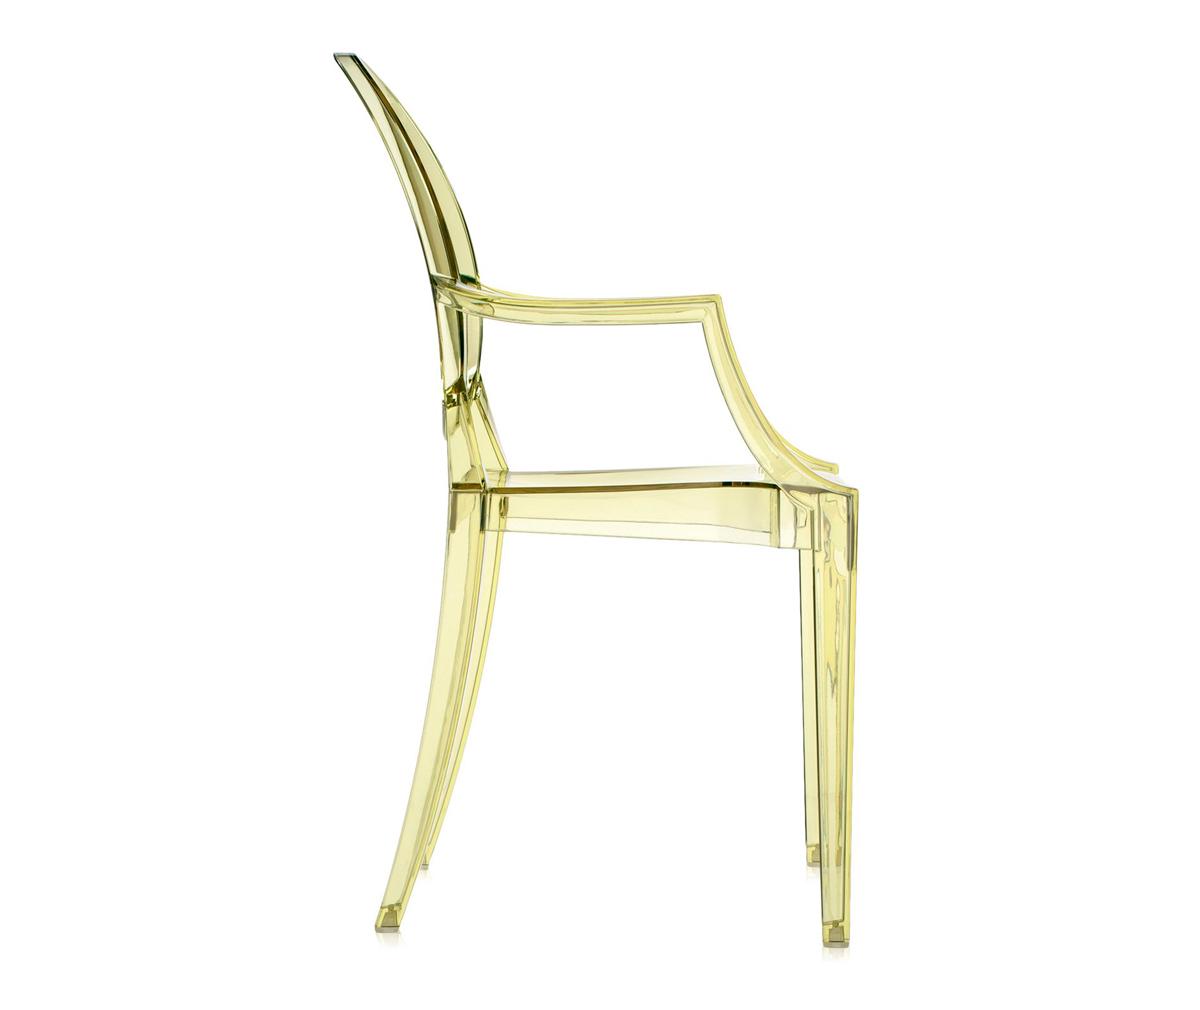 louis ghost tuoli keltainen veps l inen. Black Bedroom Furniture Sets. Home Design Ideas